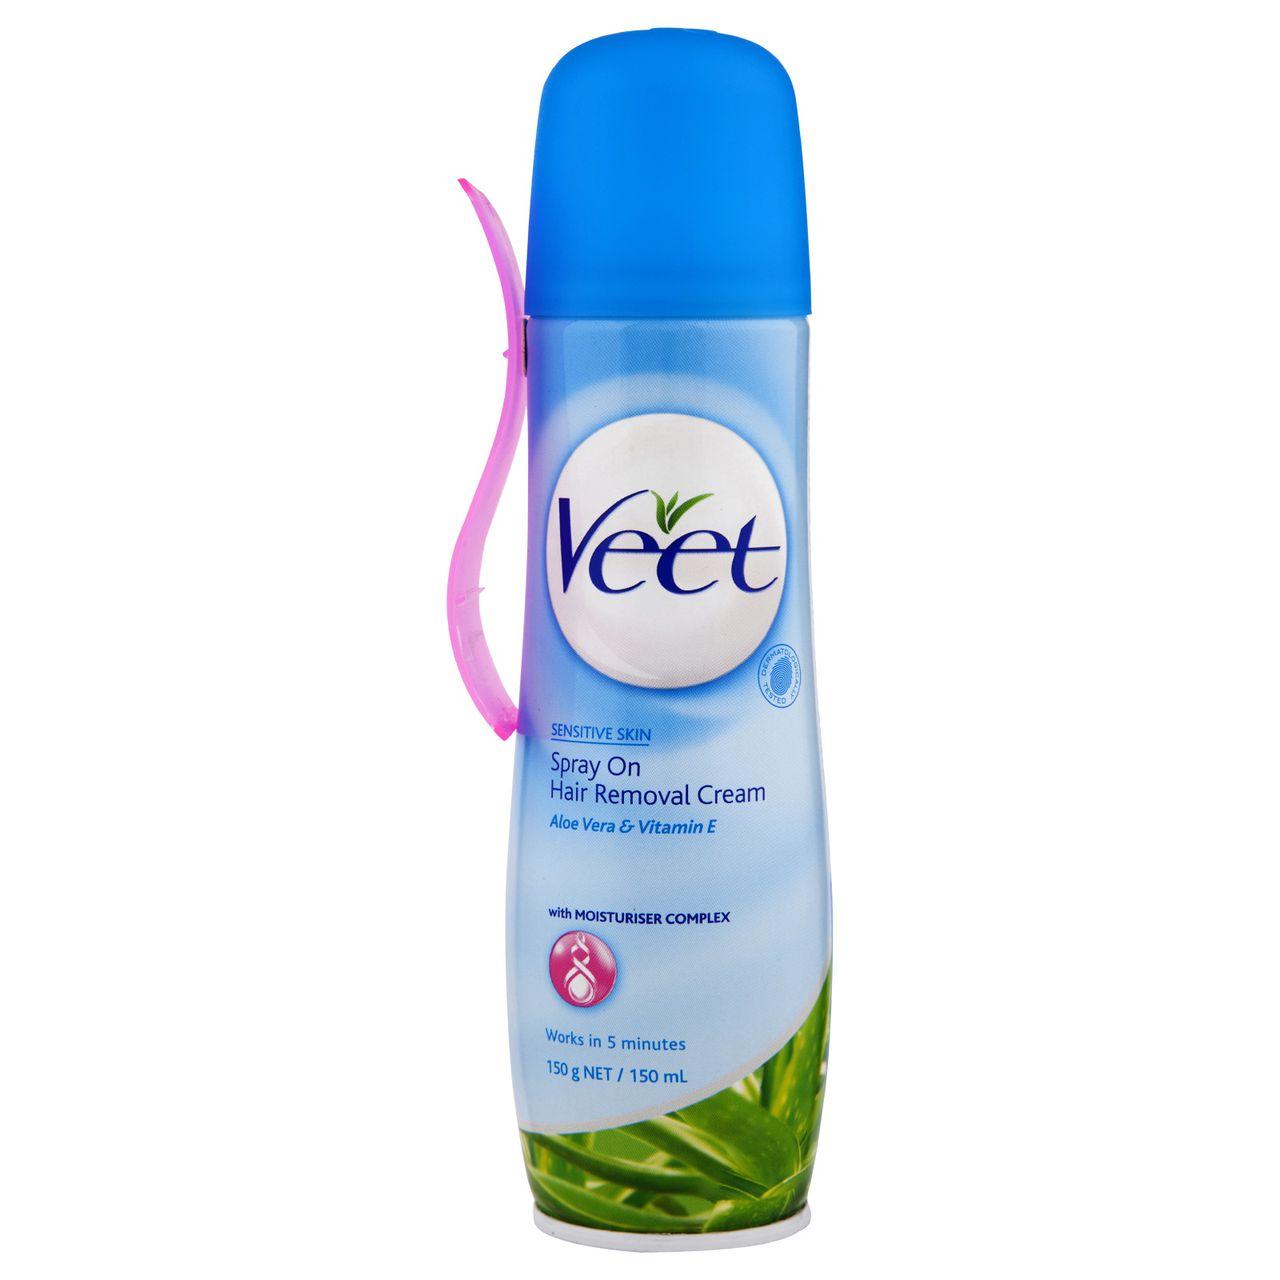 Veet Spray On Hair Removal Cream Sensitive Formula Veet Australia